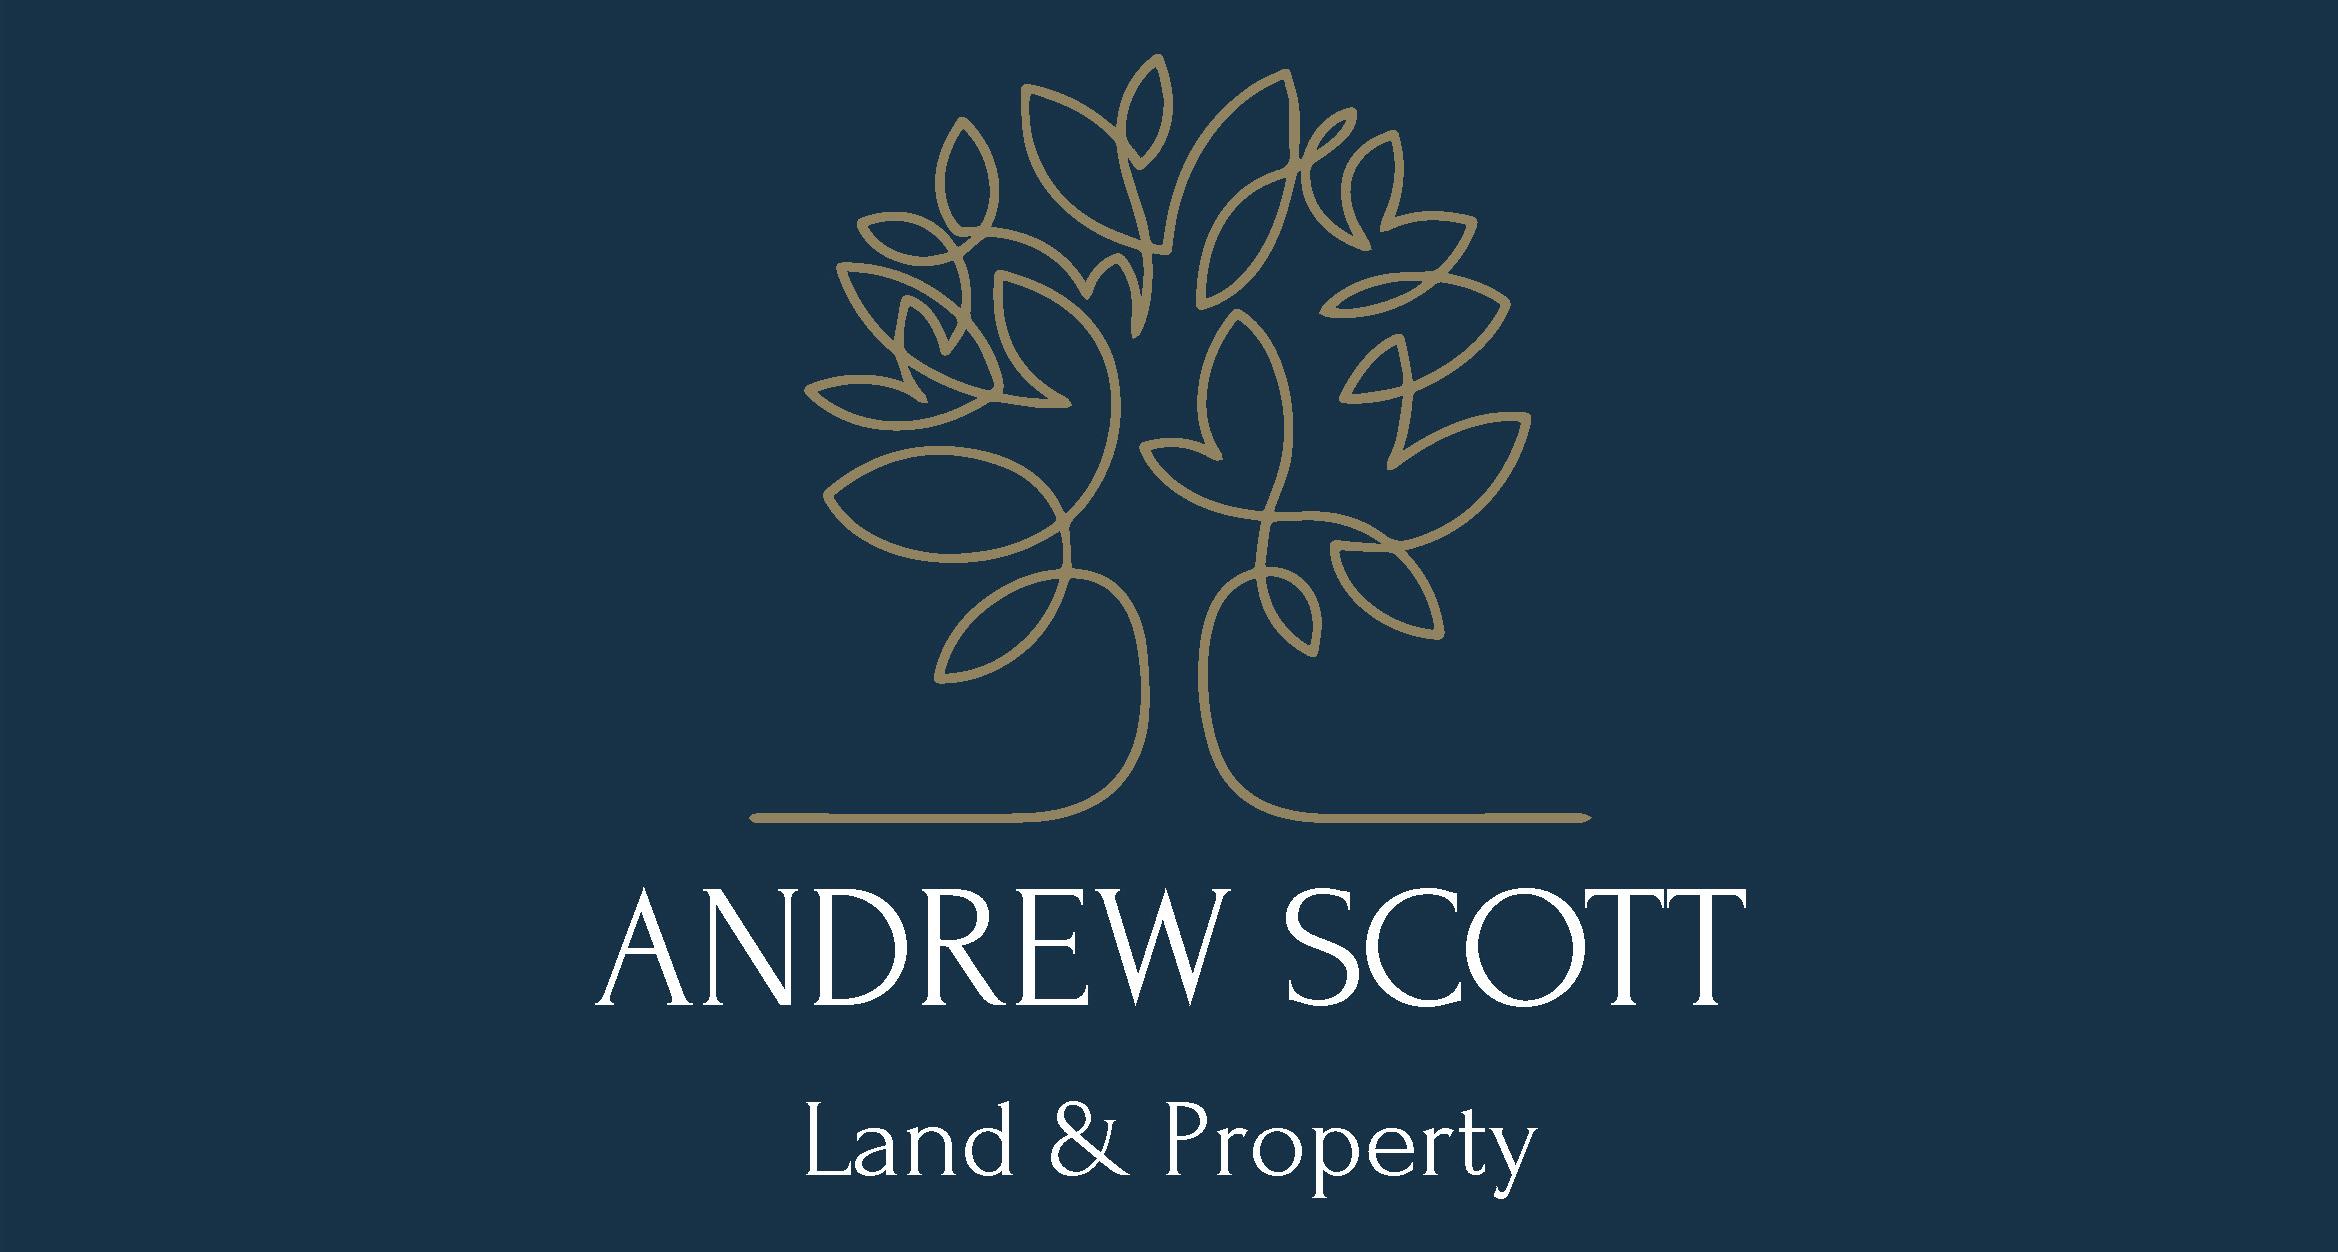 Andrew Scott Land & Property